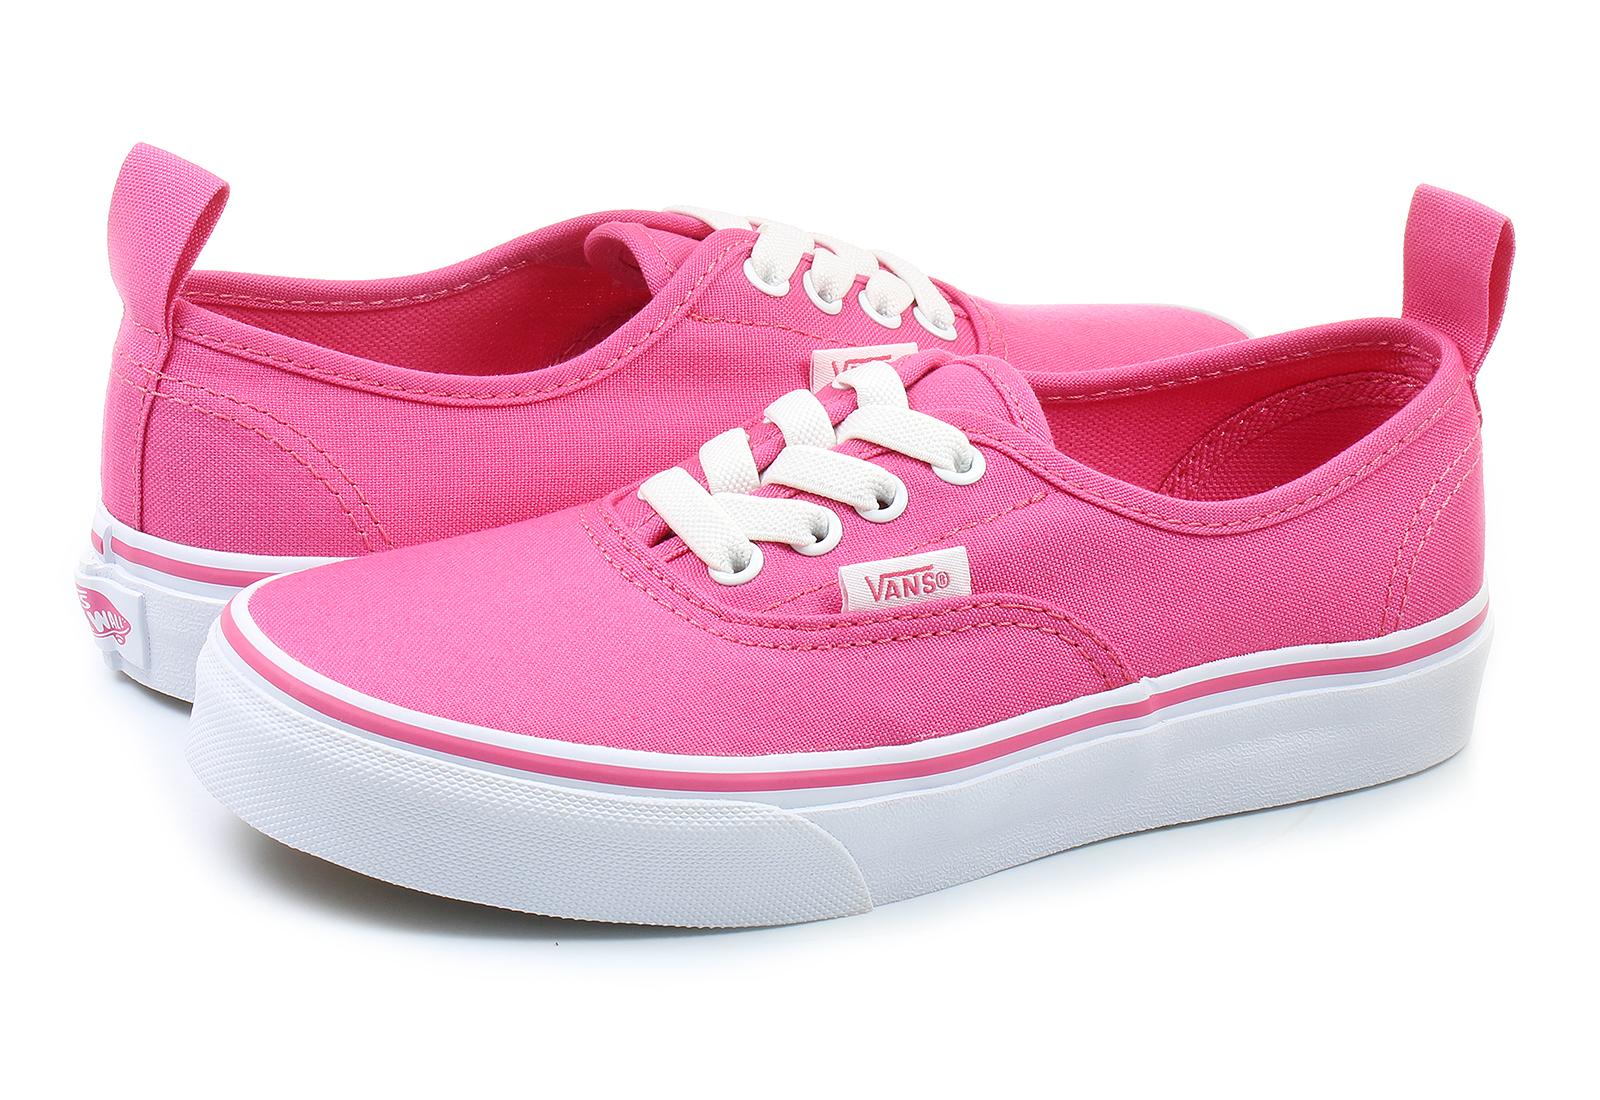 306de66cc98 Vans Sneakers - Authentic Elastic Lace - VA38H480A - Online shop ...